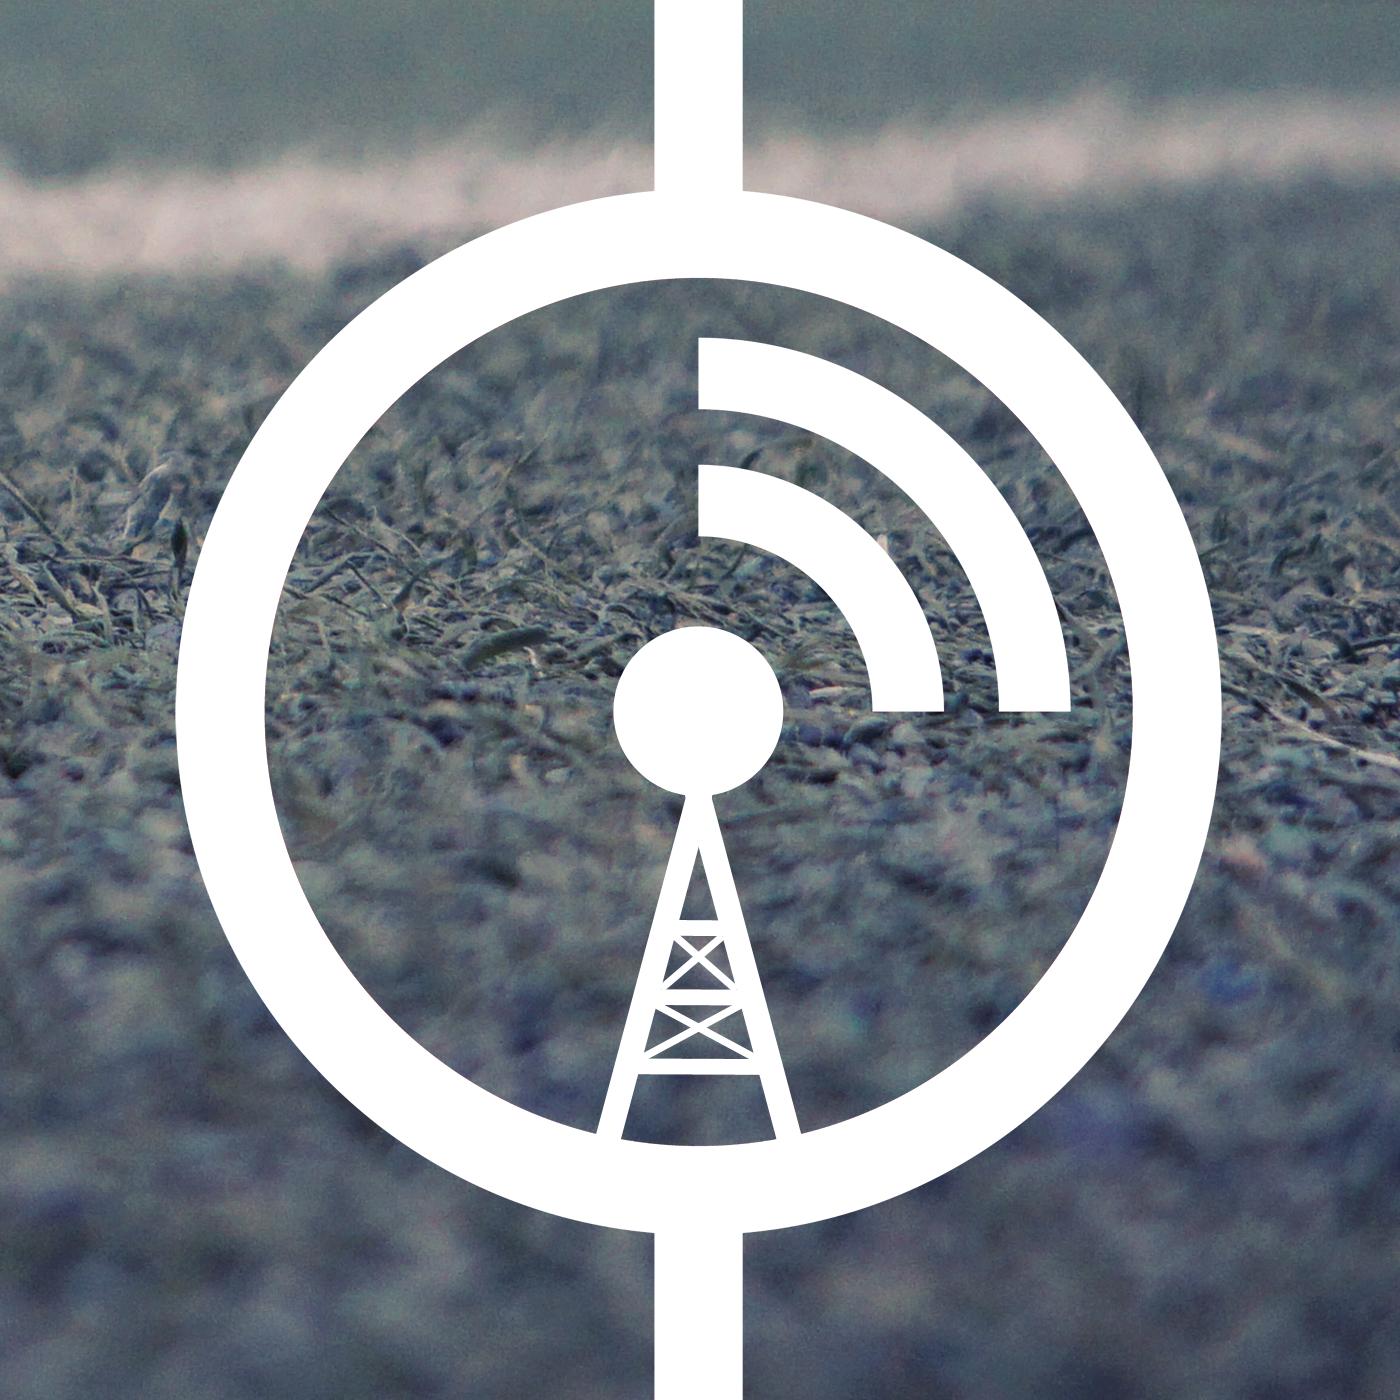 Schlusskonferenz – Der Bundesliga-Podcast - Rasenfunk - Der Fußball-Podcast